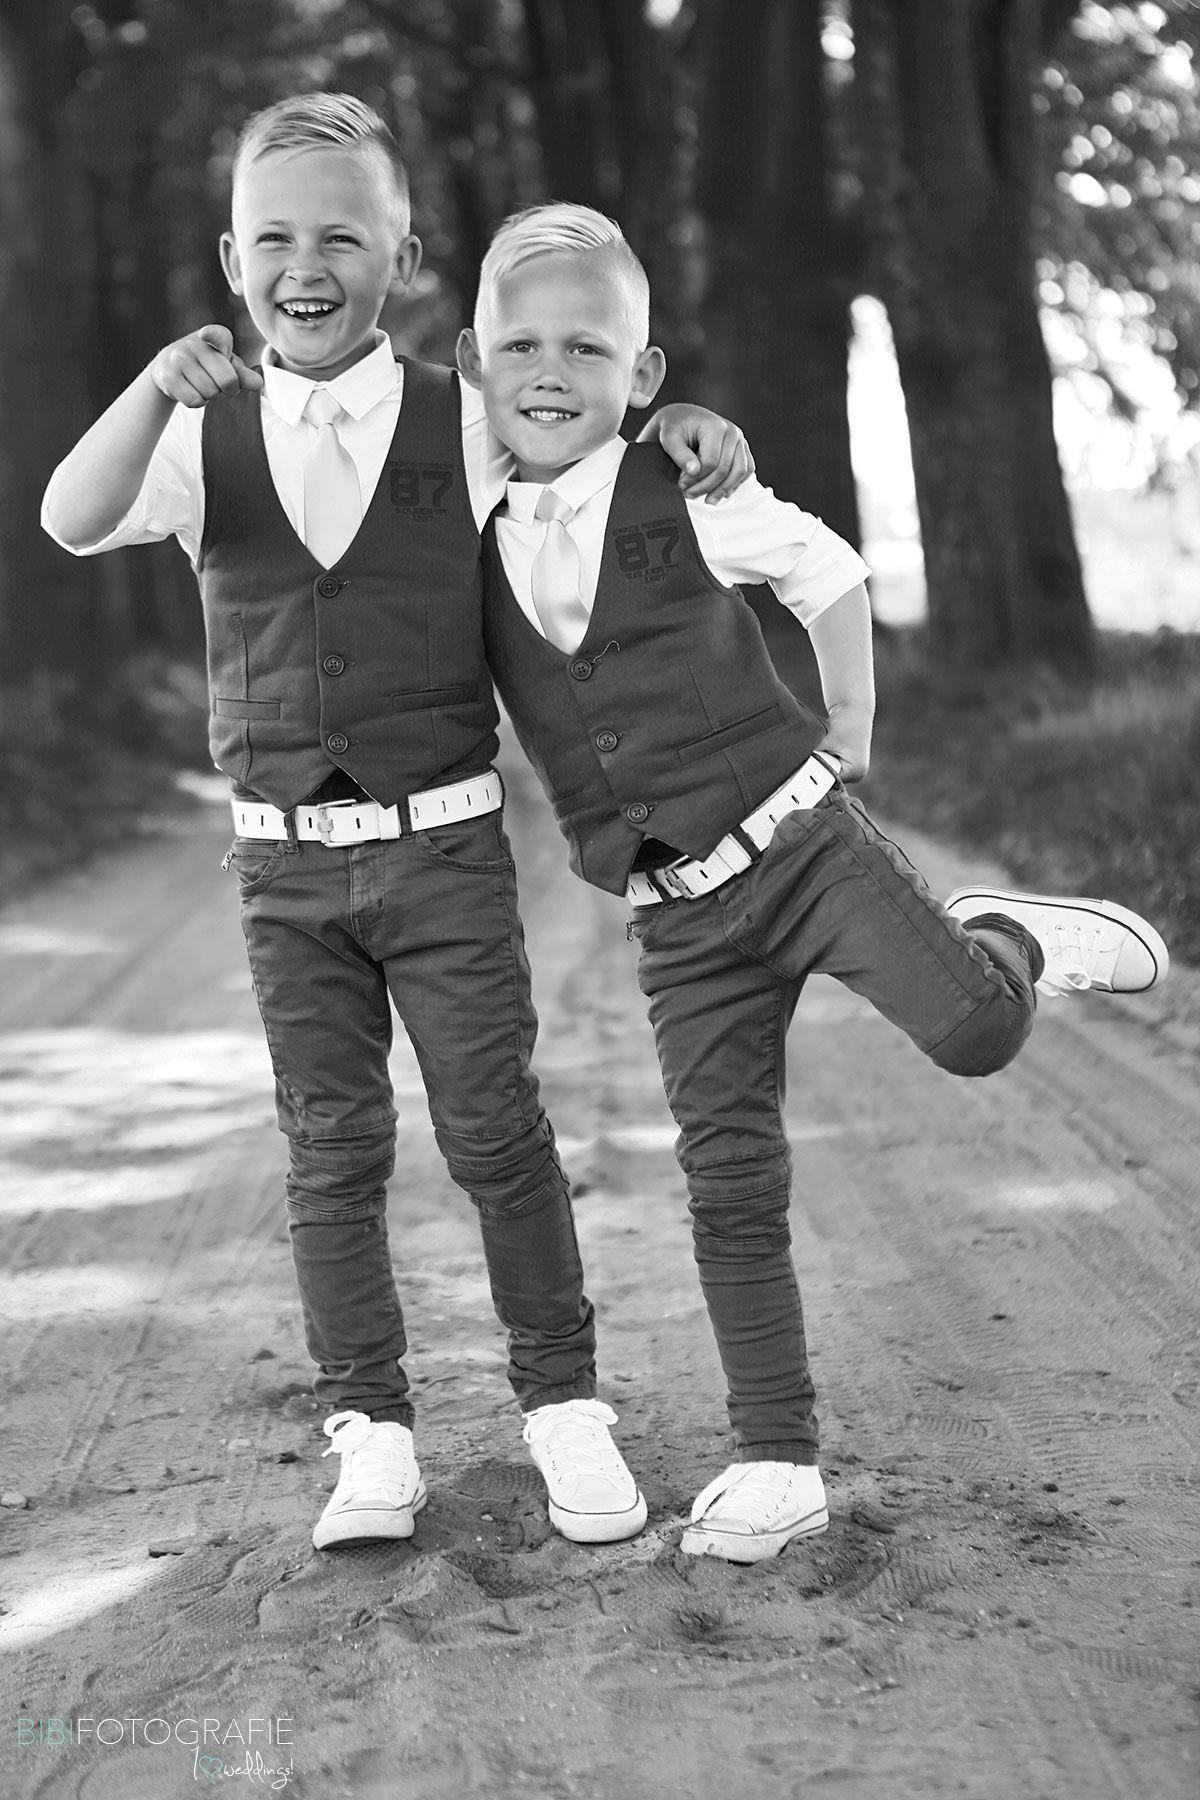 Trouwfotografie Kinderen Bruidsfotografie Trouwen